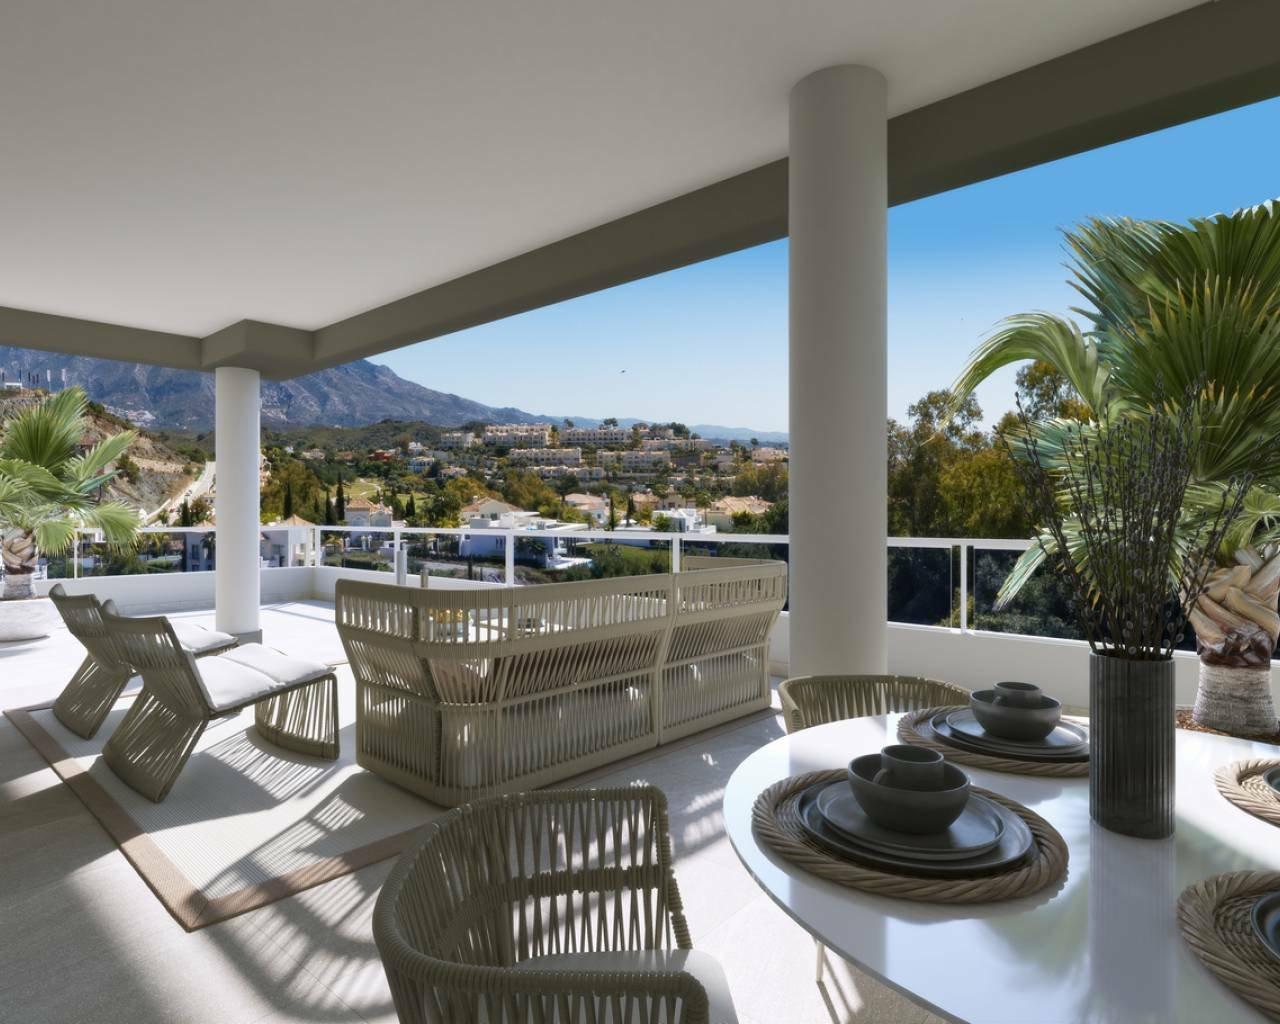 Apartment in Benahavís, Andalusia, Spain 1 - 11522974